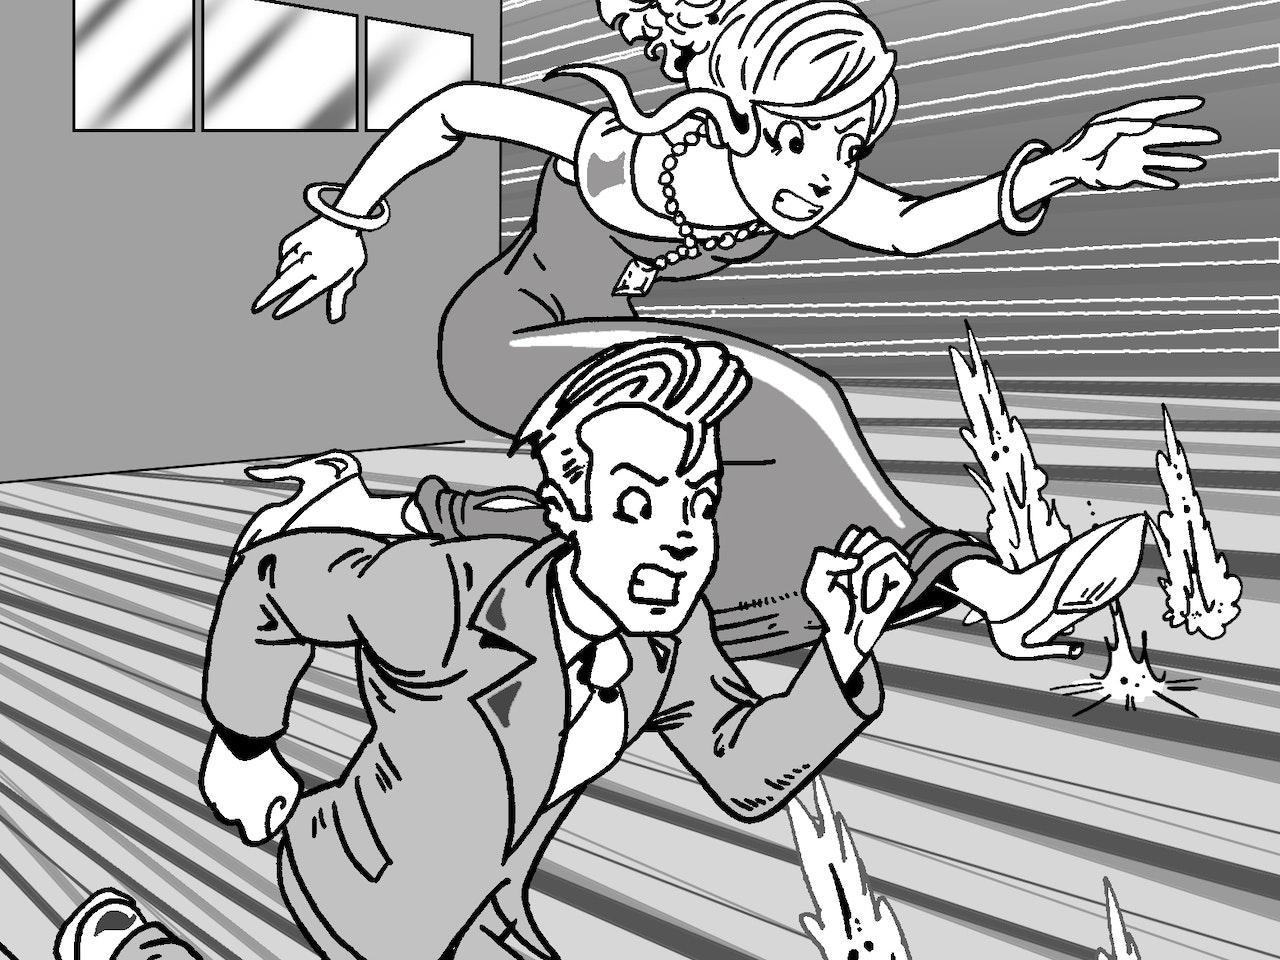 mystery detective  adventure danger spies james bond teen manga anime childrens cartoon comic strip Book cover illustration animation